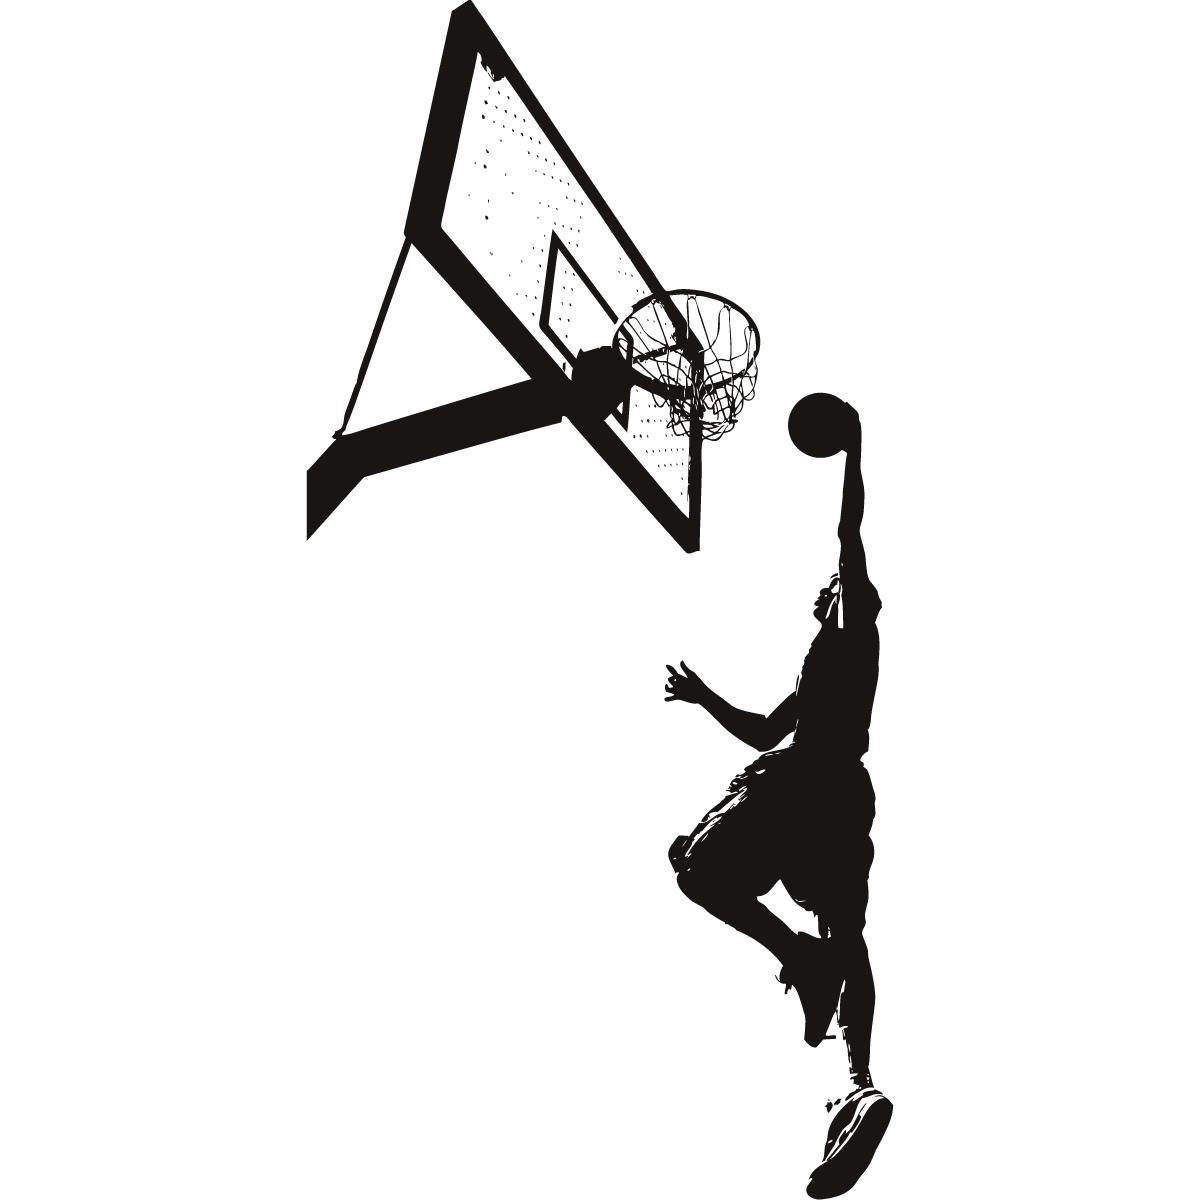 Basketball Slam Dunk Sports And Hobbies Wall Art Decal